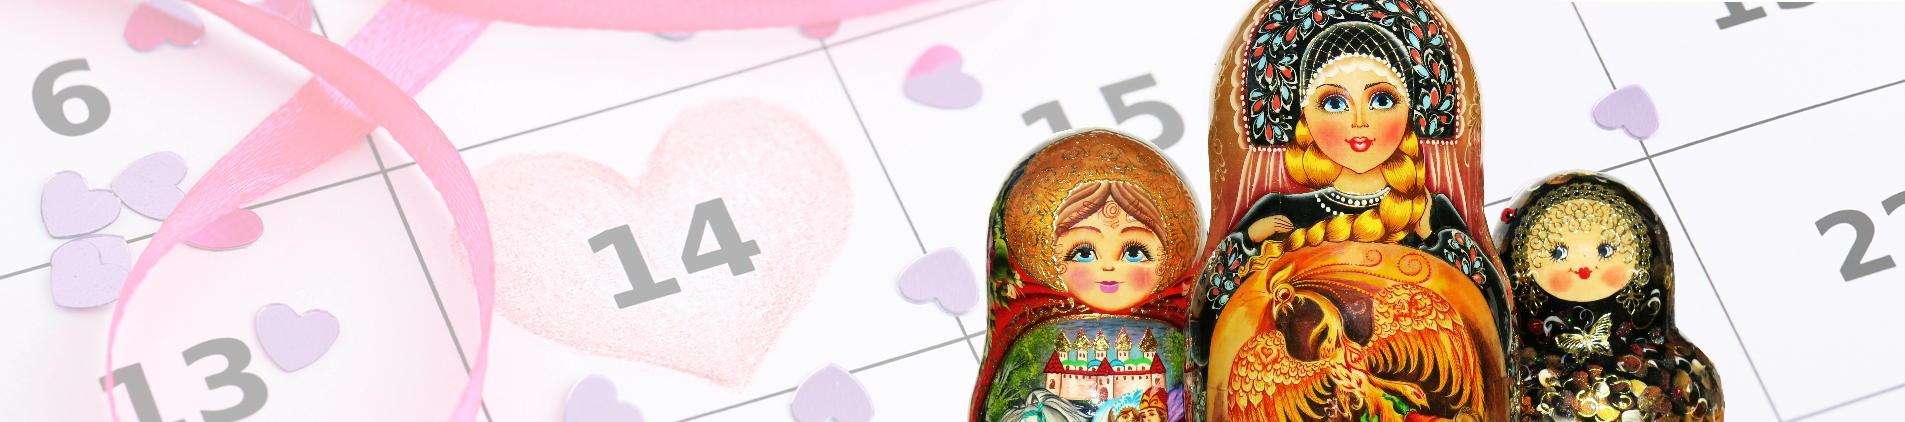 Valentine's Day gifts, Russian nesting dolls, matryoshka, babushka